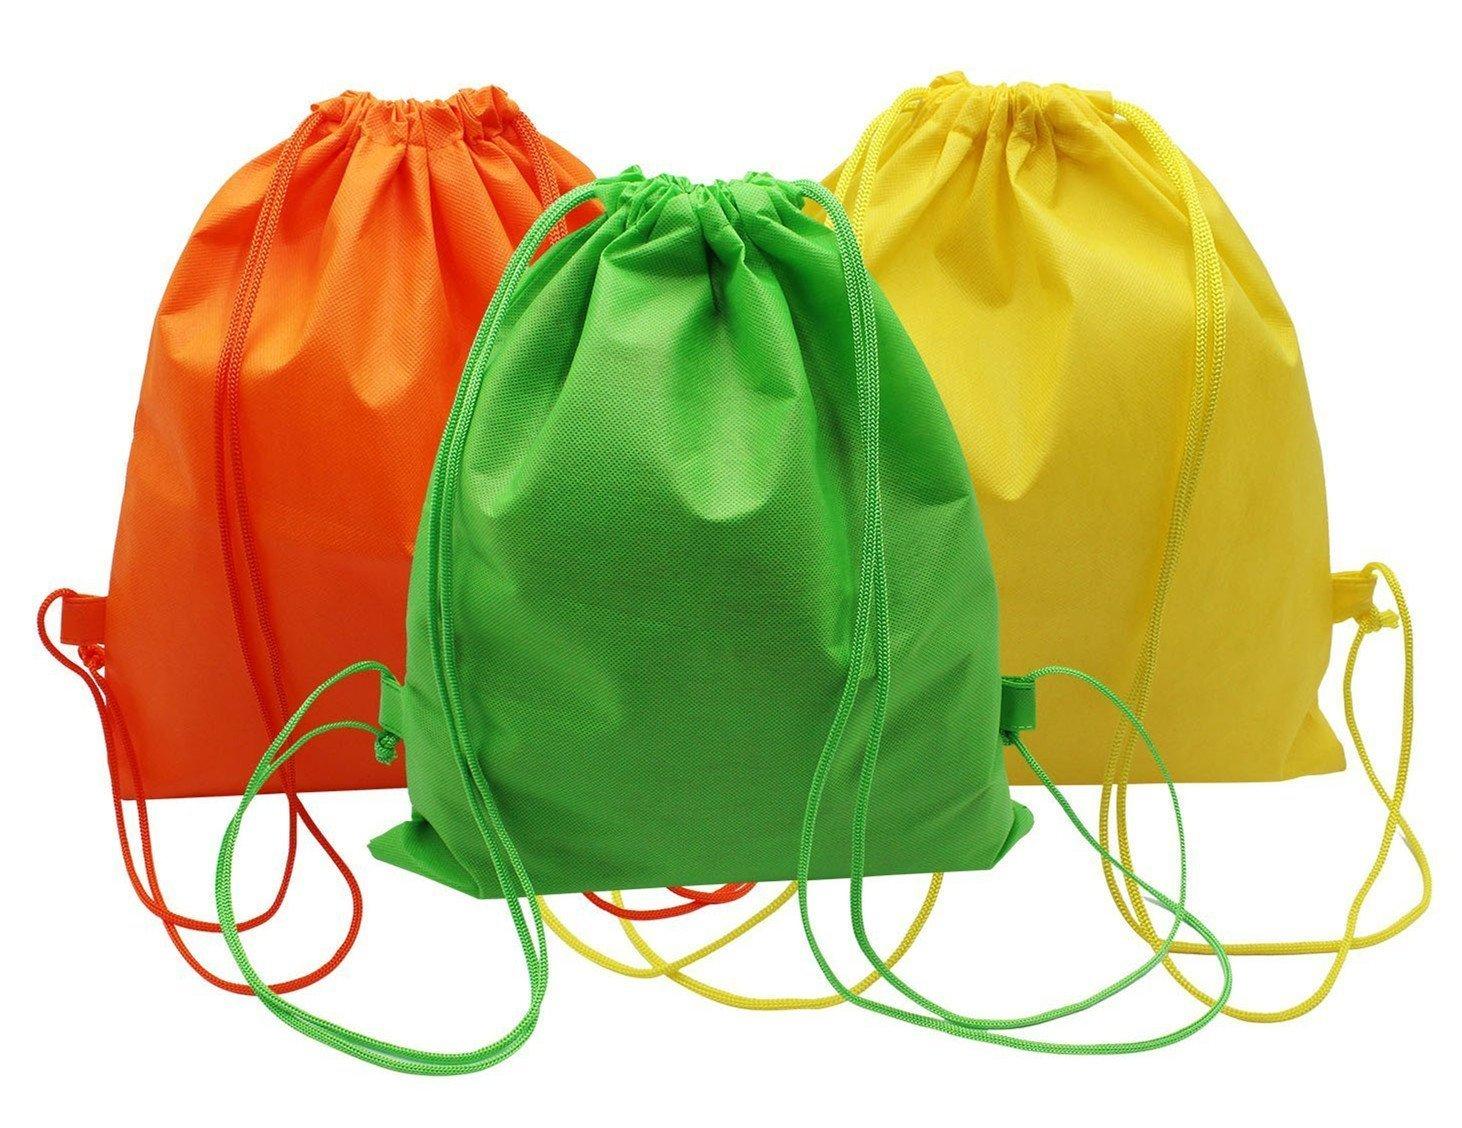 mzd8391ビーチタオル巾着トートバッグバックパックSackpack Cinch Bag for Kids /レディース/メンズ – クイックドライ&軽量 – のプール、水泳、ビーチ、キャンプ、ビーチブランケット、旅行、誕生日パーティーFavor ( 3パック) B072JGJWSL